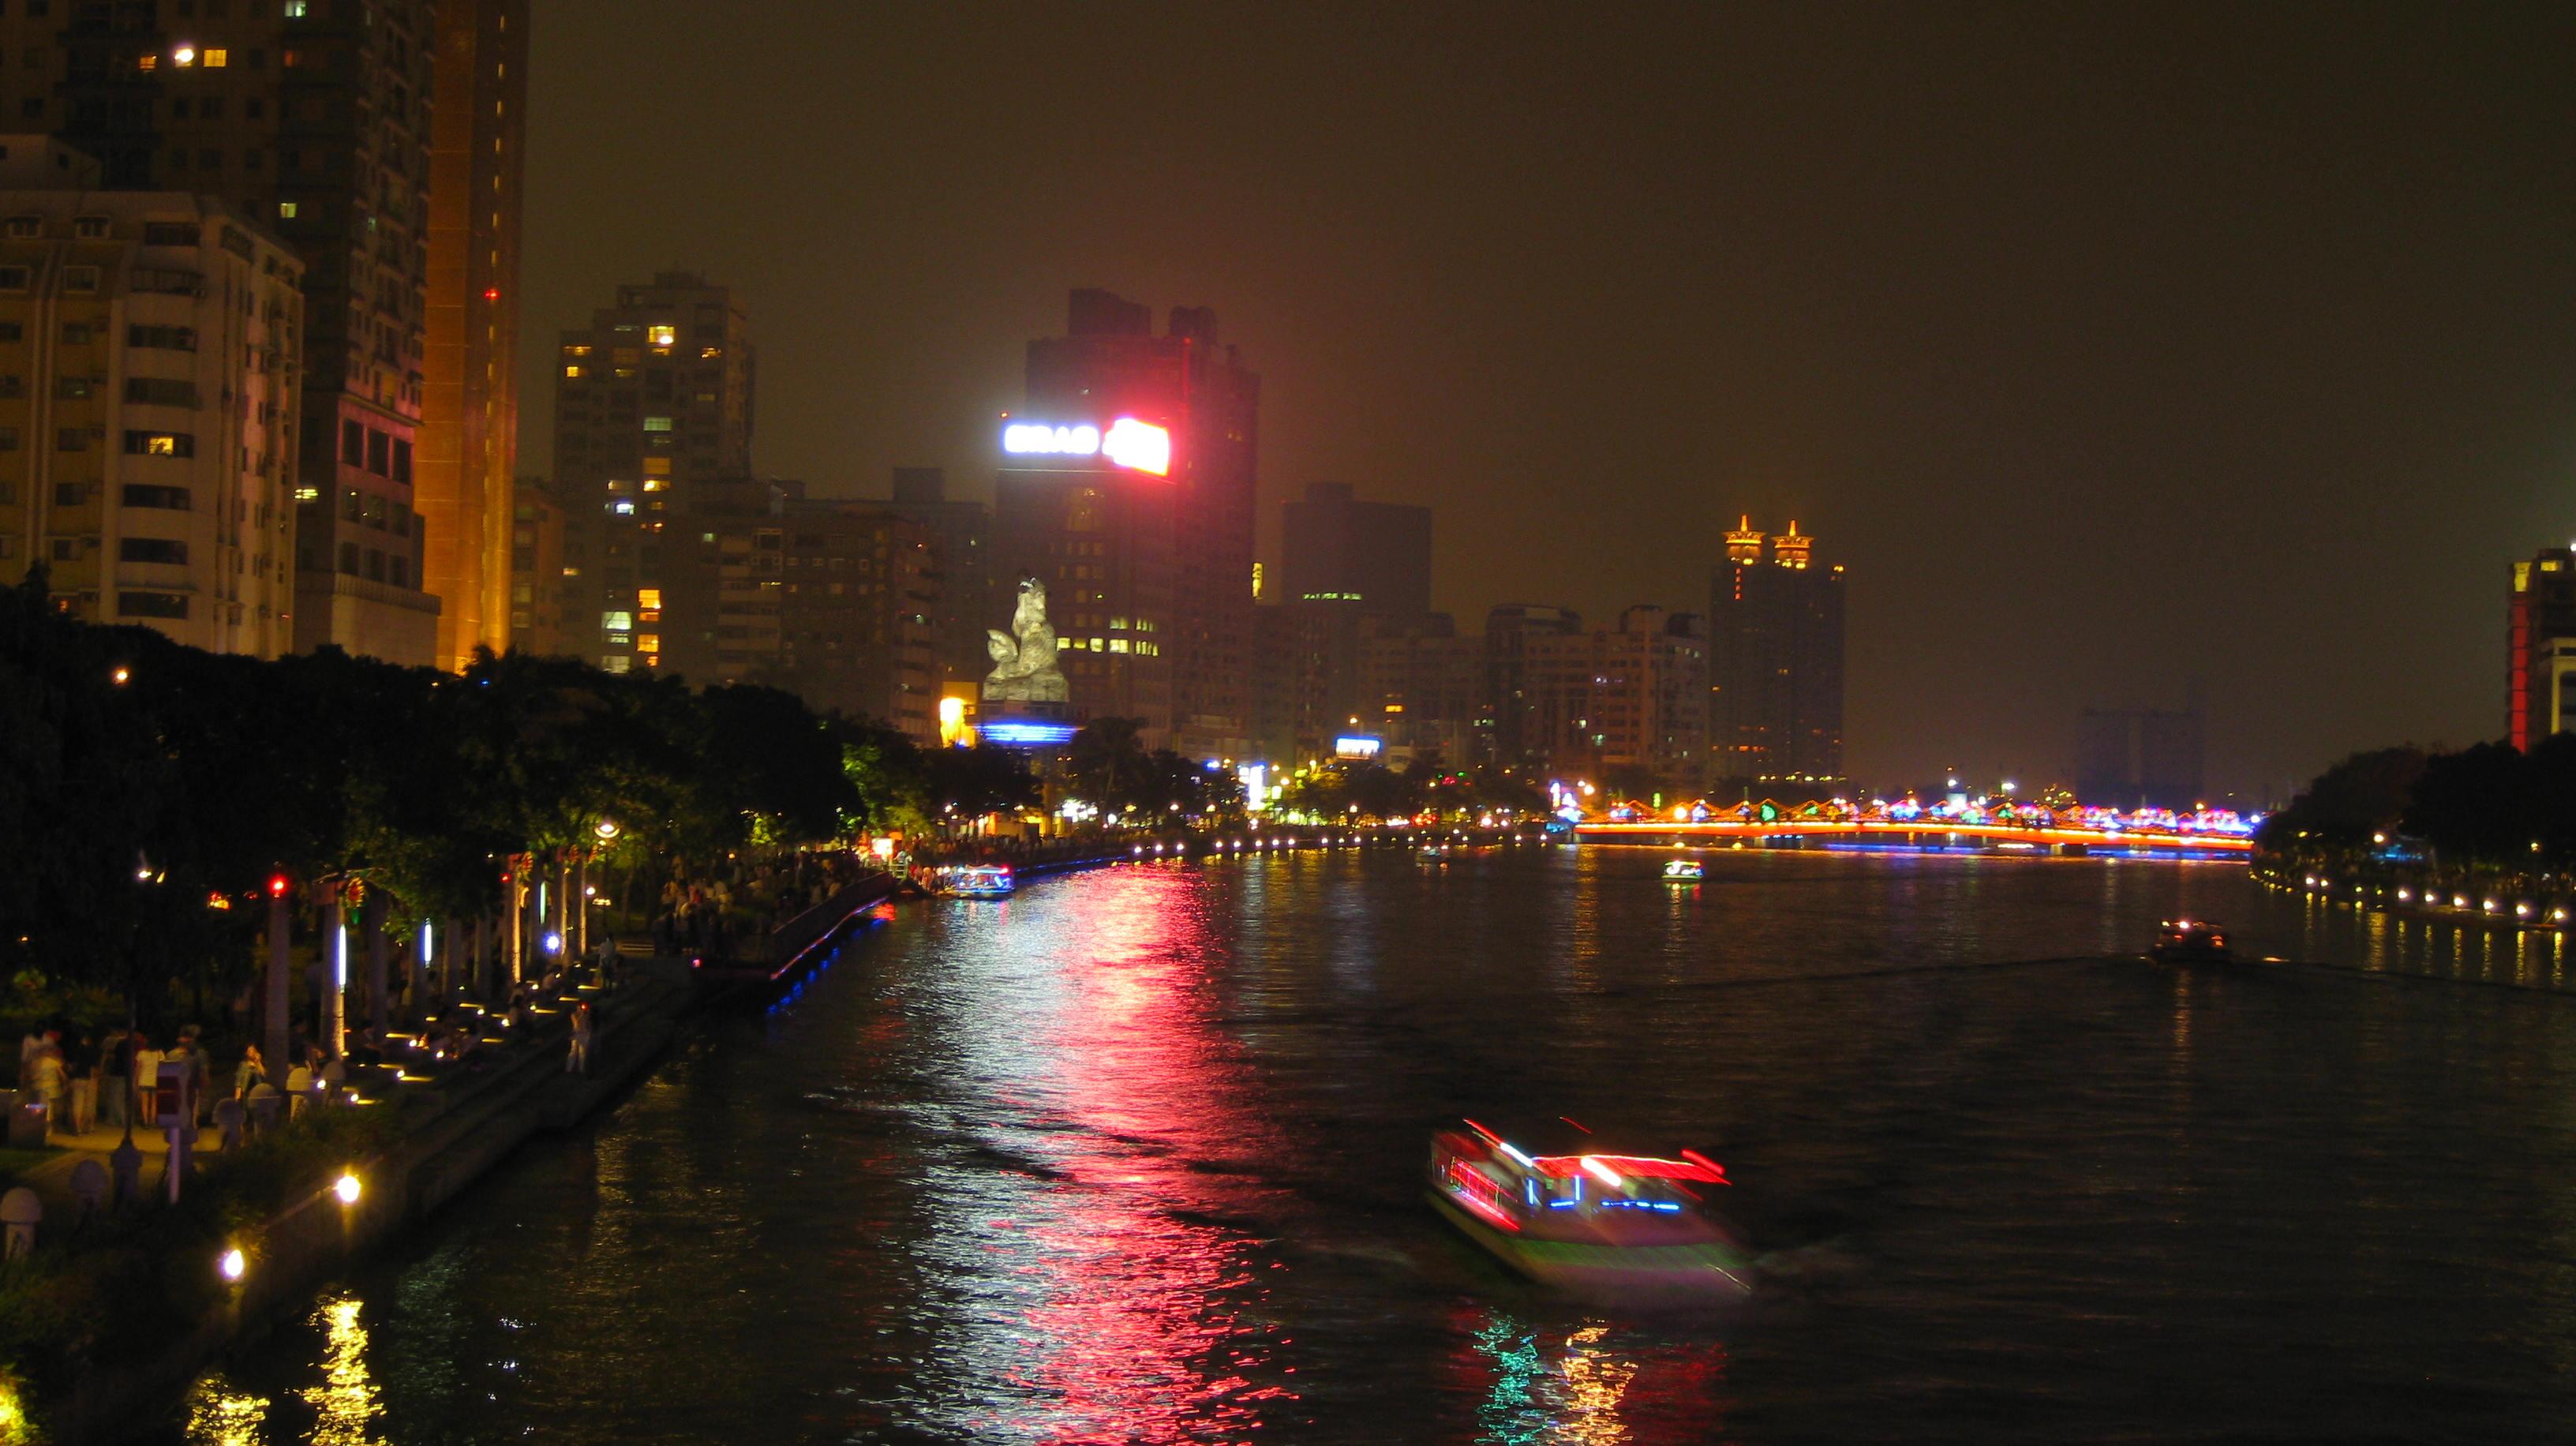 kaohsiung love river img 2923.jpg